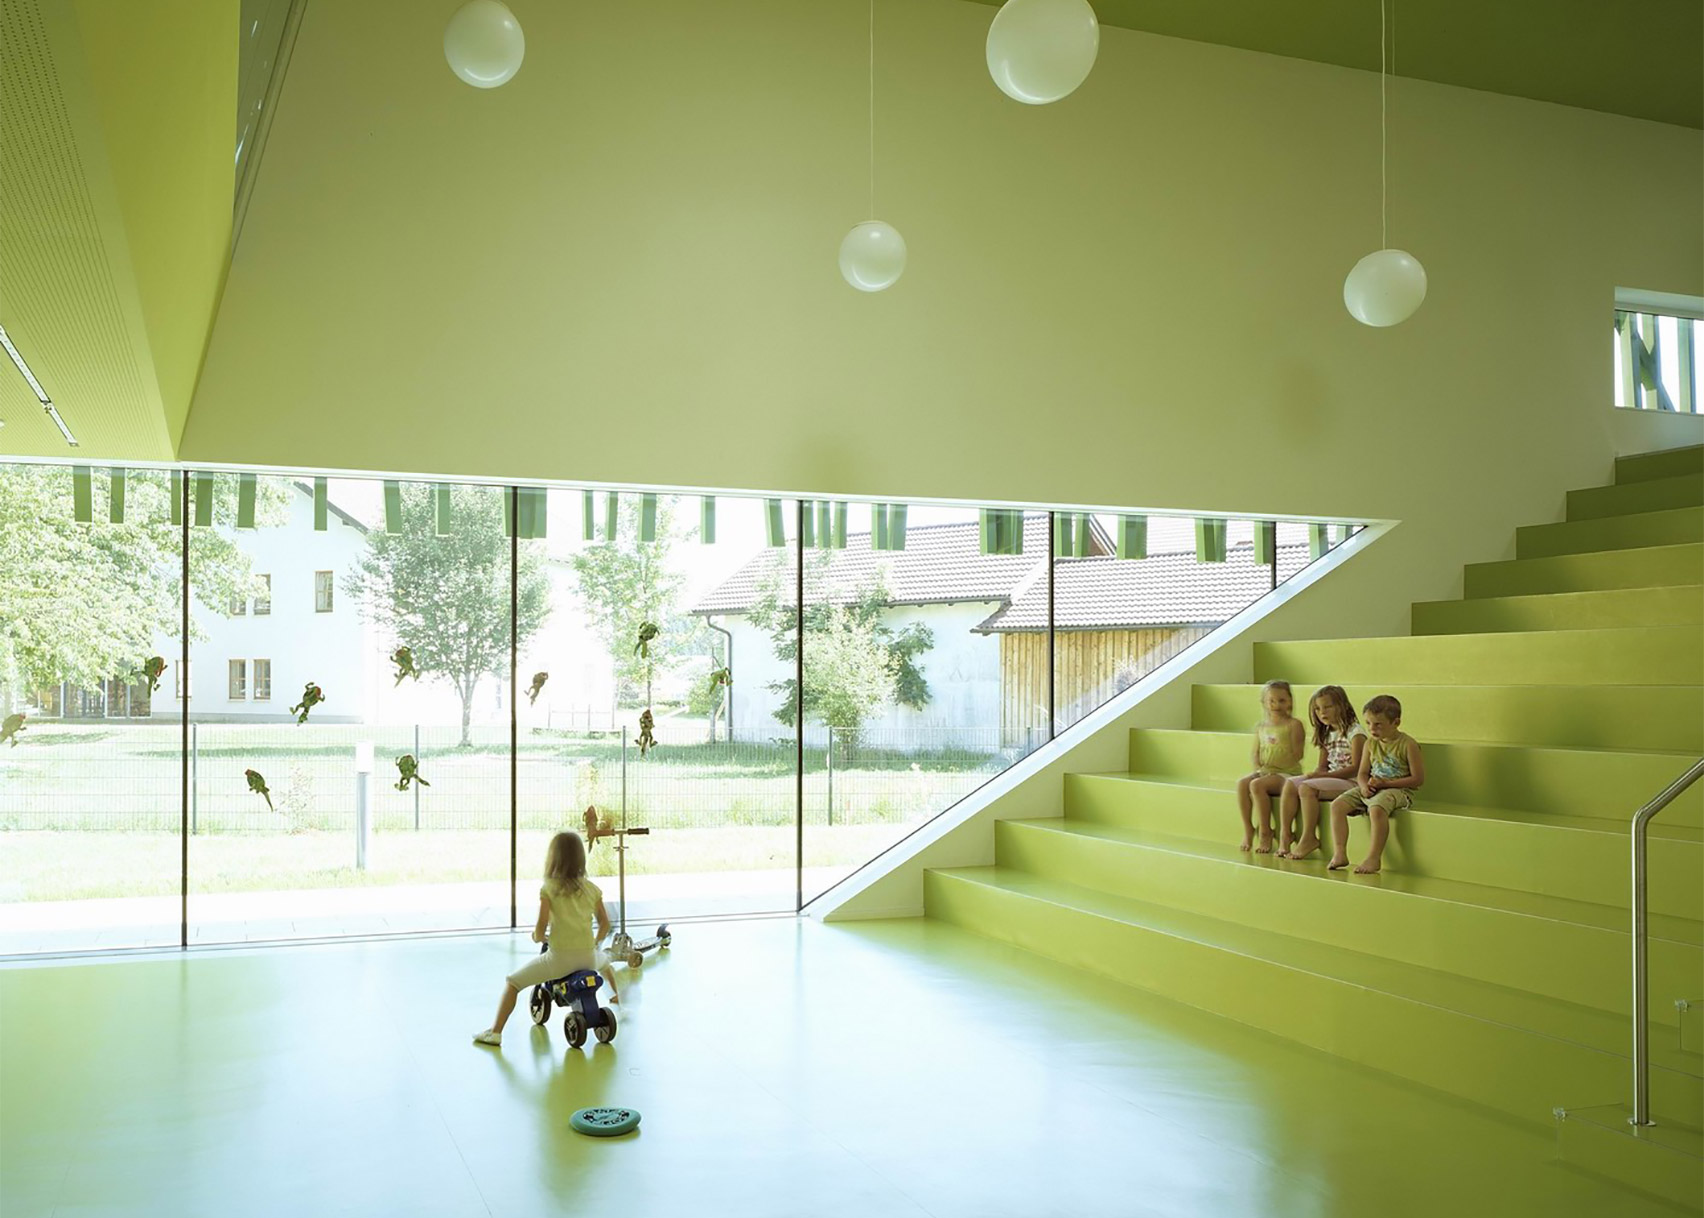 Kindergarten Sighartstein by Kadawittfeldarchitektur